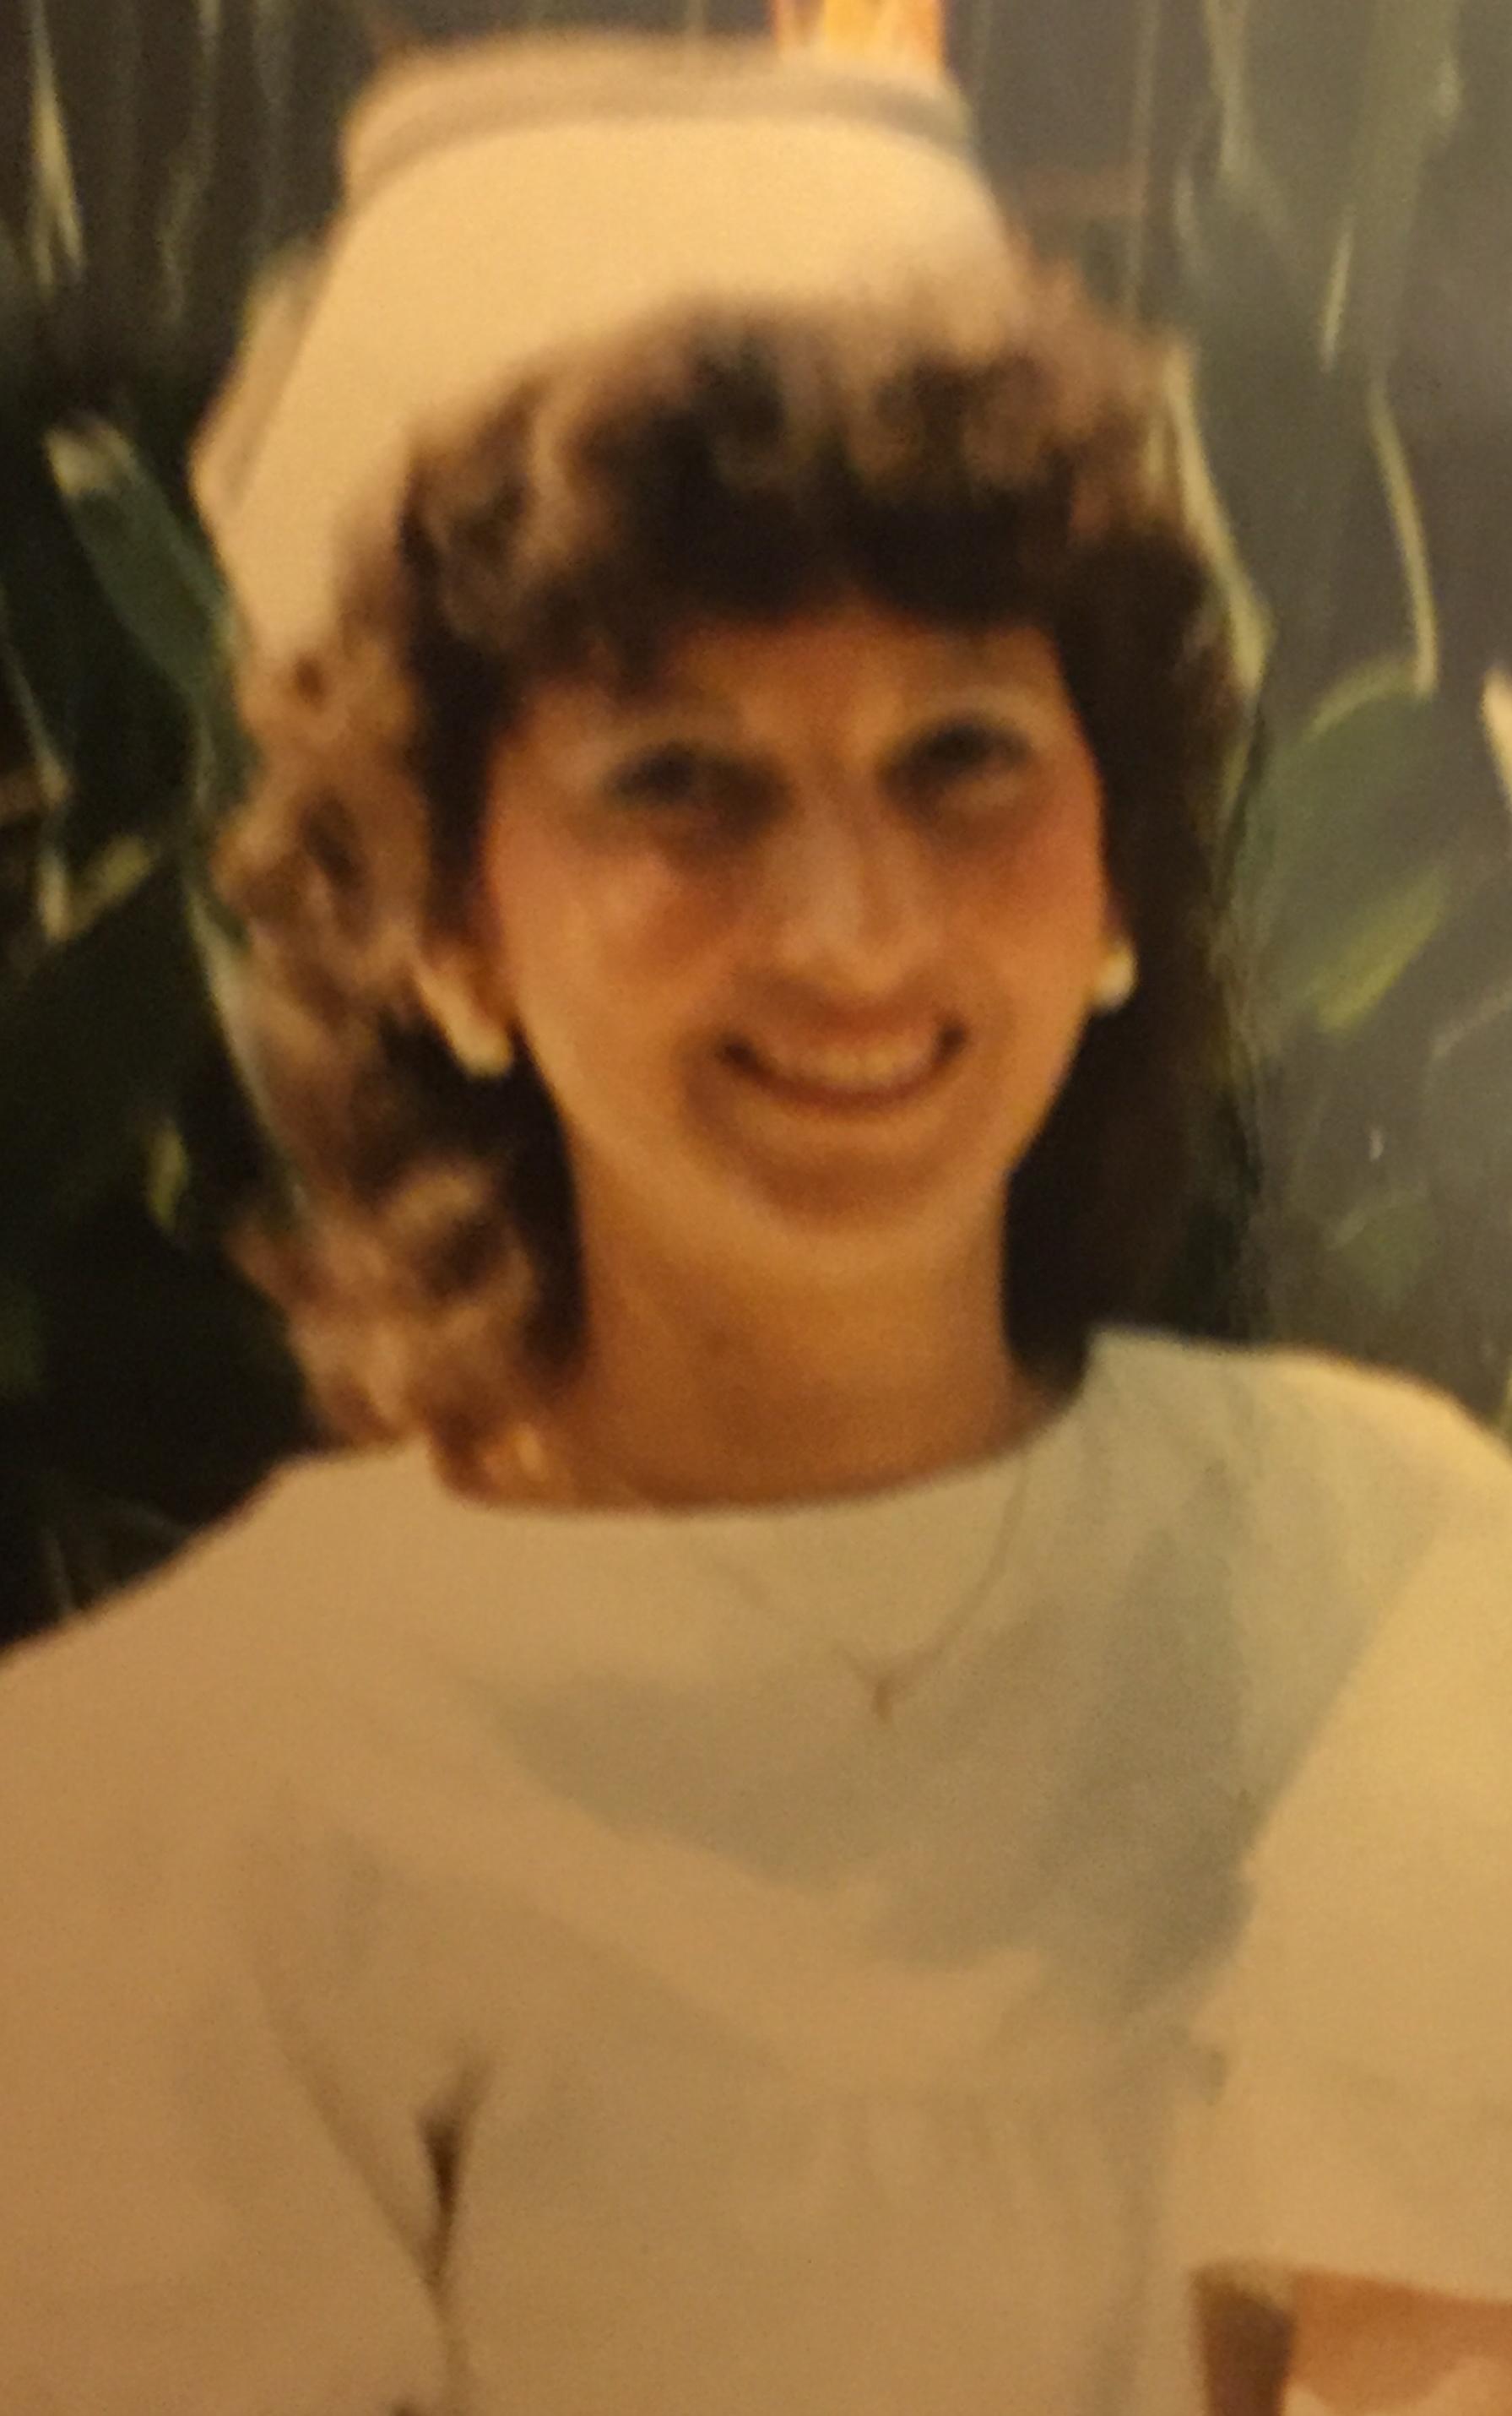 Valerie Melvin as a nurse for cape coral hospital circa 1986